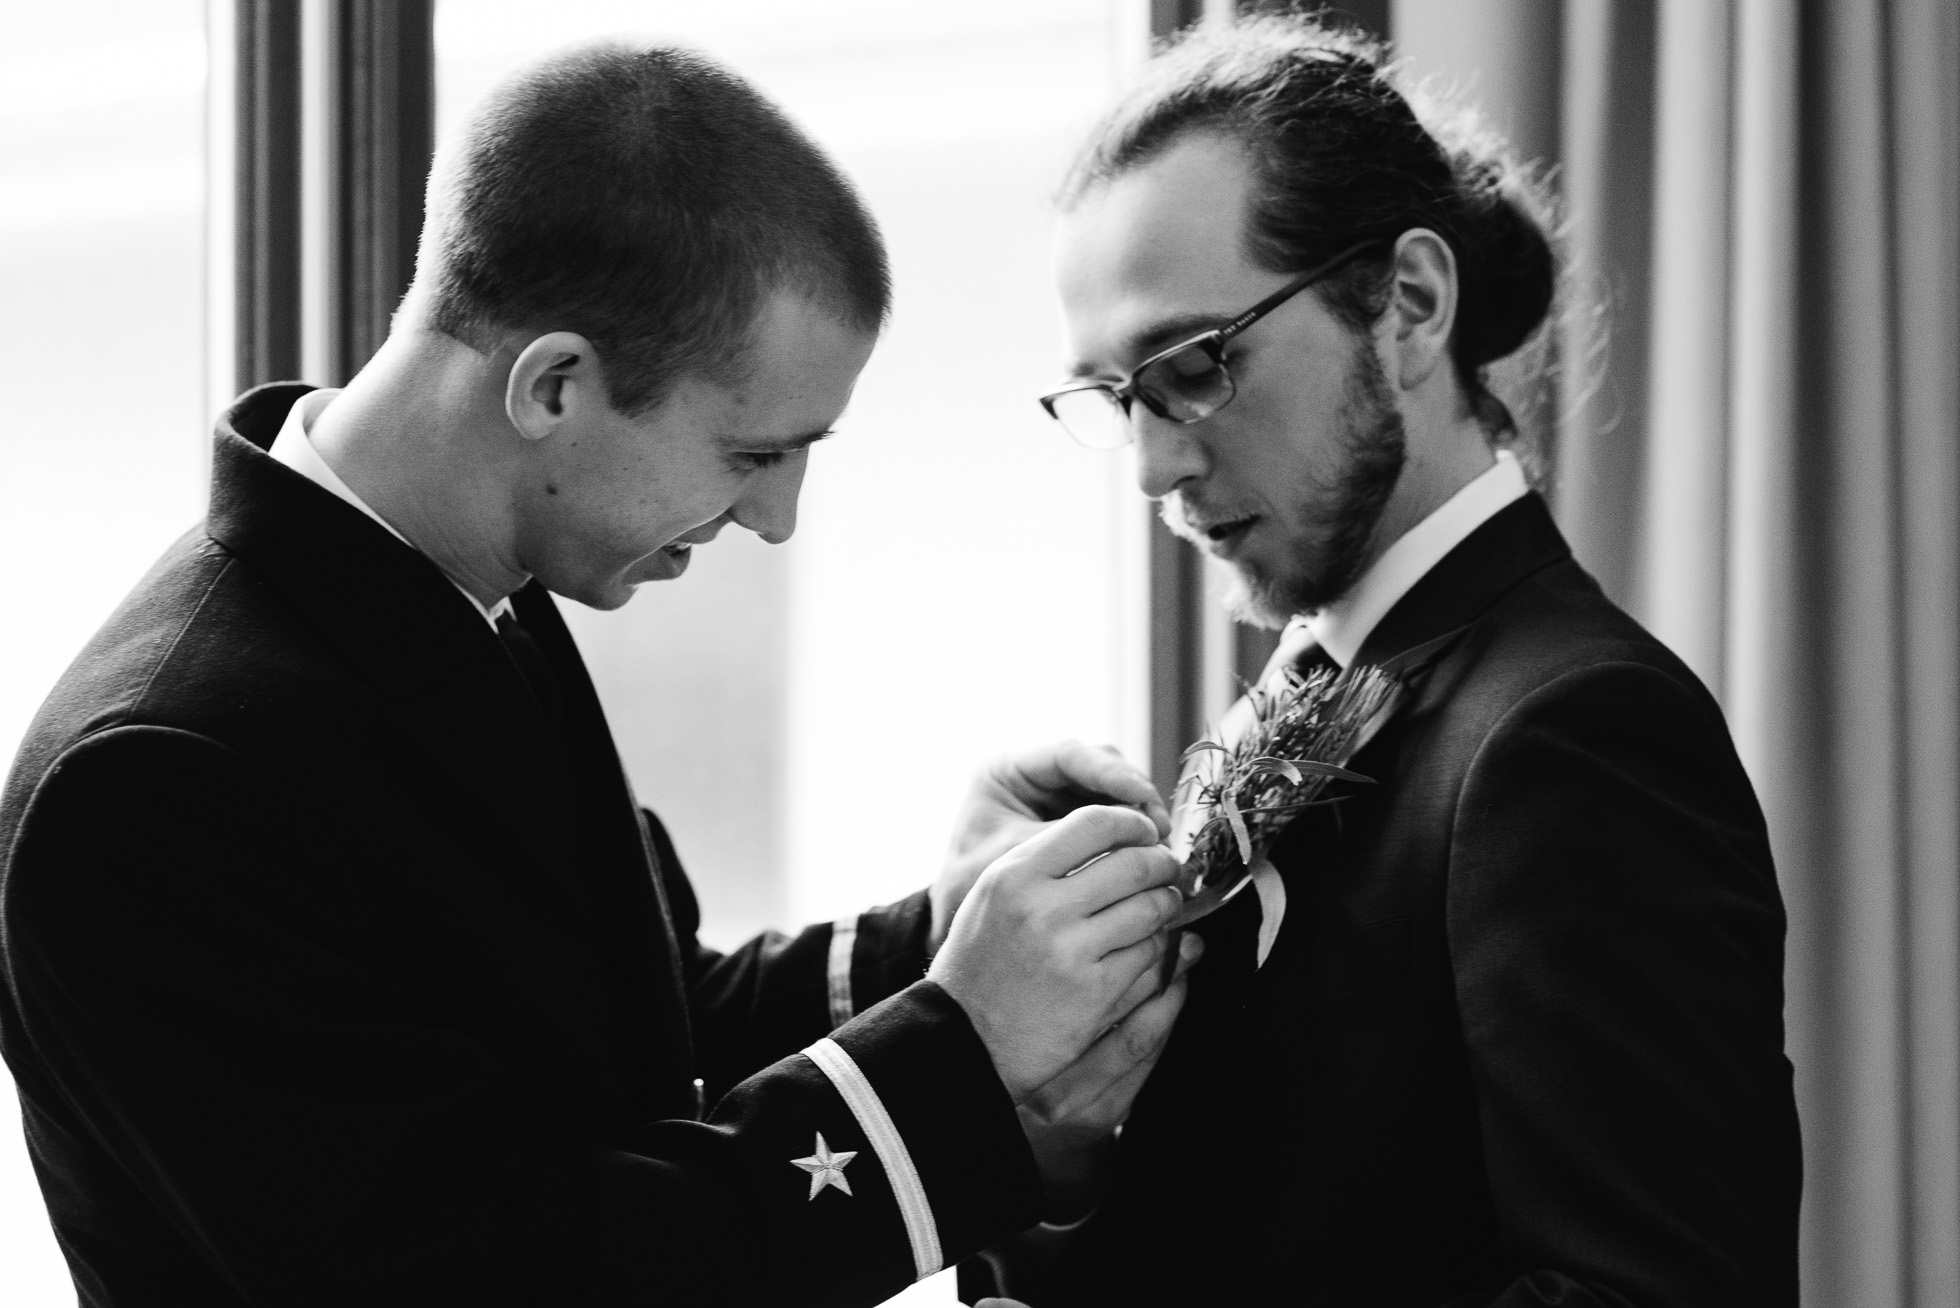 St. Michaels of the Valley Ligonier PA wedding, wedding photography-2.jpg